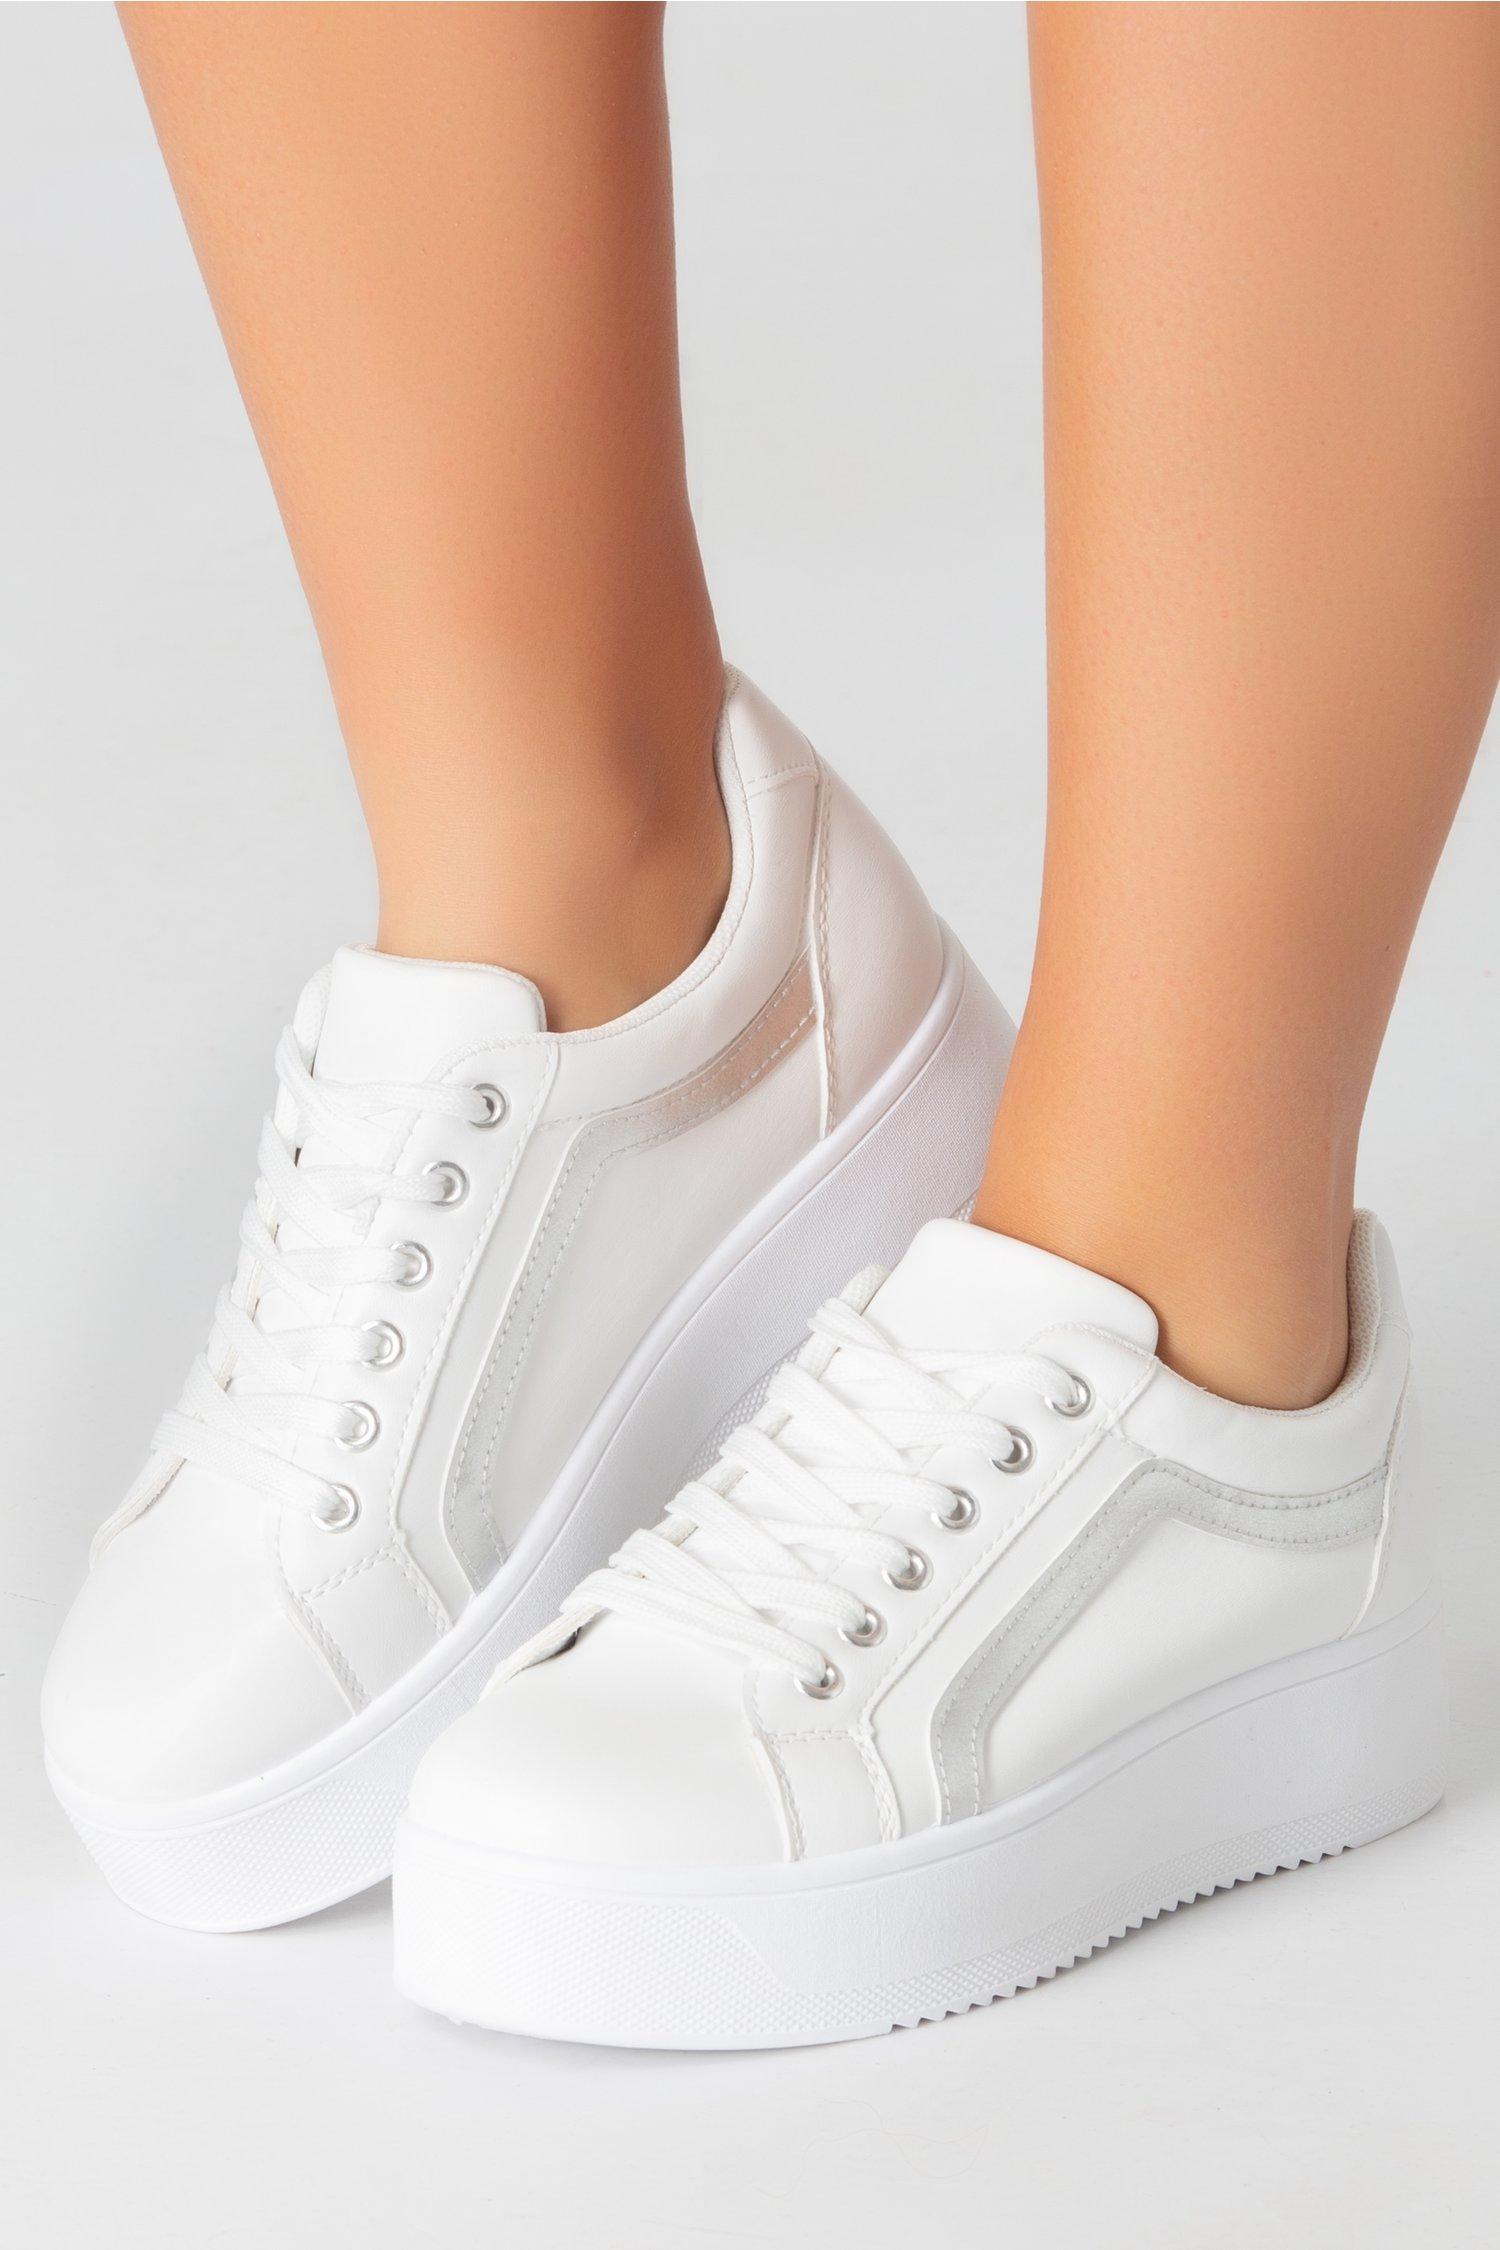 Pantofi sport albi cu dunga argintie si talba groasa